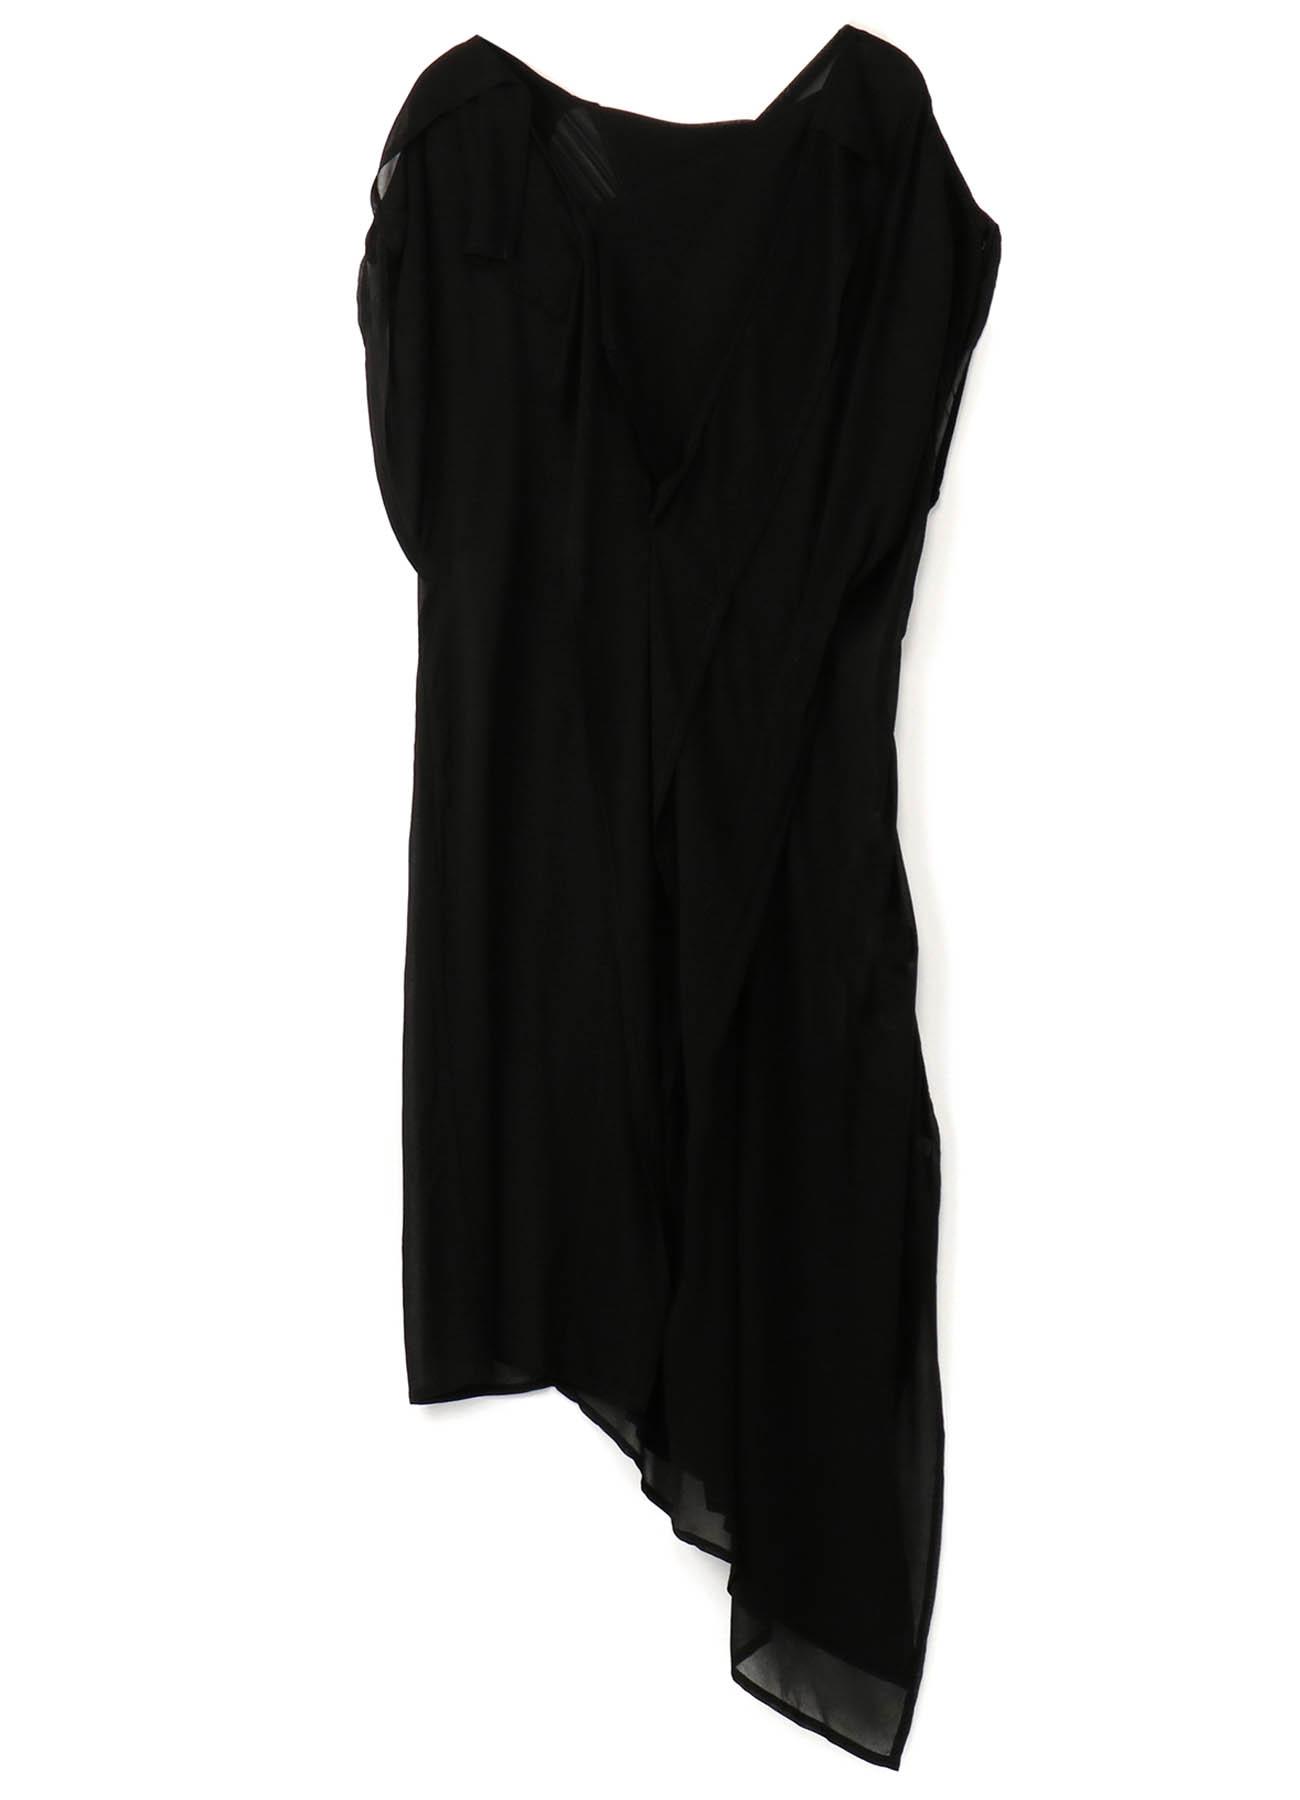 Cu/Chiffon Square Design Dress